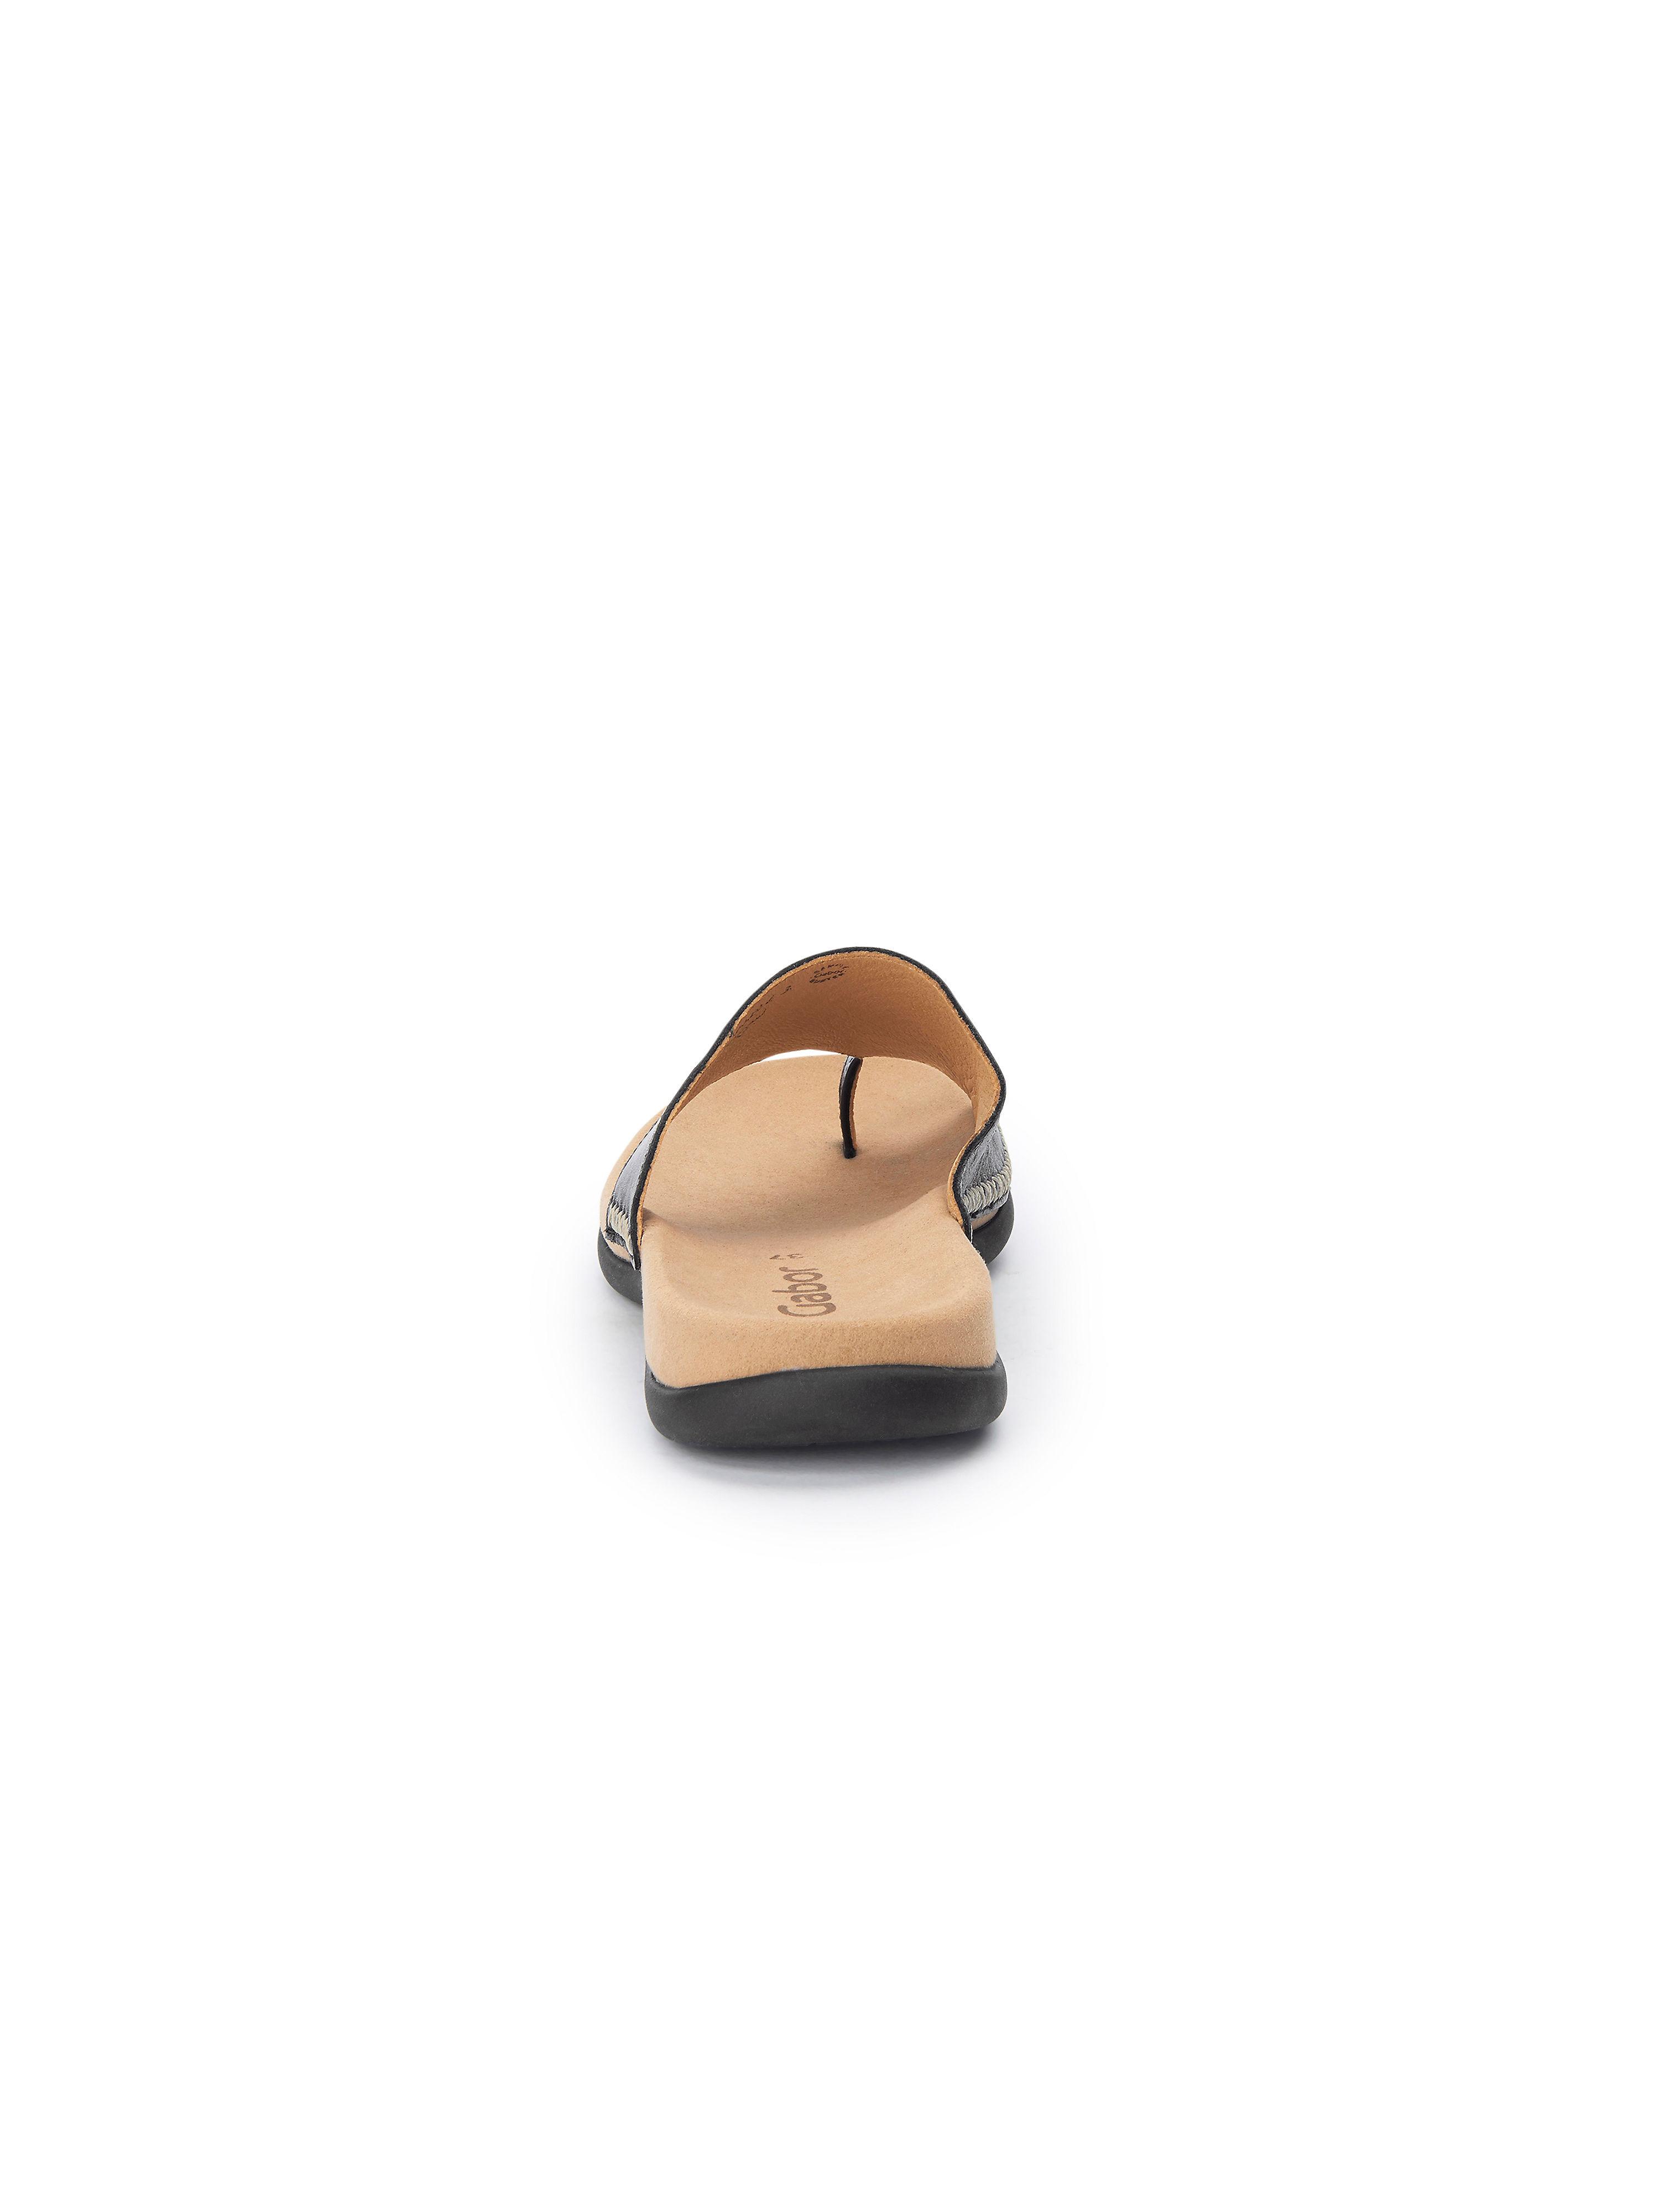 Gabor Leder - Pantolette aus 100% Leder Gabor - Schwarz Gute Qualität beliebte Schuhe 88de09